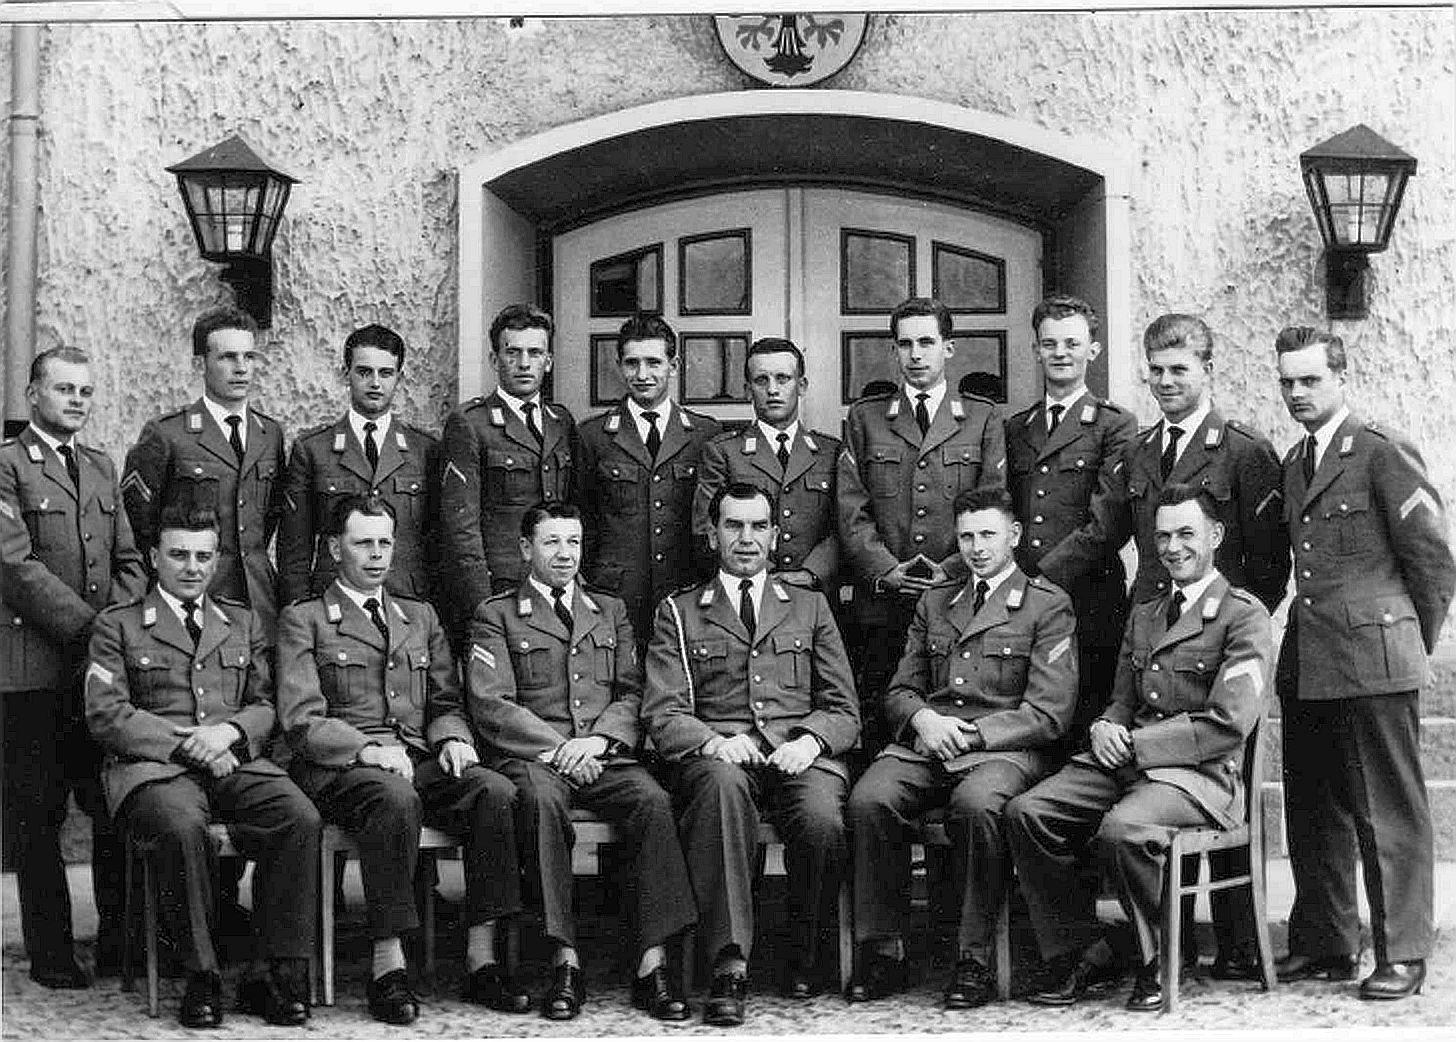 1958_Uffz Korps 2.PzAufklBtl 2 sitzend v. li StUffz Eugen Krettek, Fw Wilhelm Buck, StUffz Werner Allenstein, HptFw Hans Sonntag KpFw, StUffz Hugo Schrade, StUffz Günter Schulze